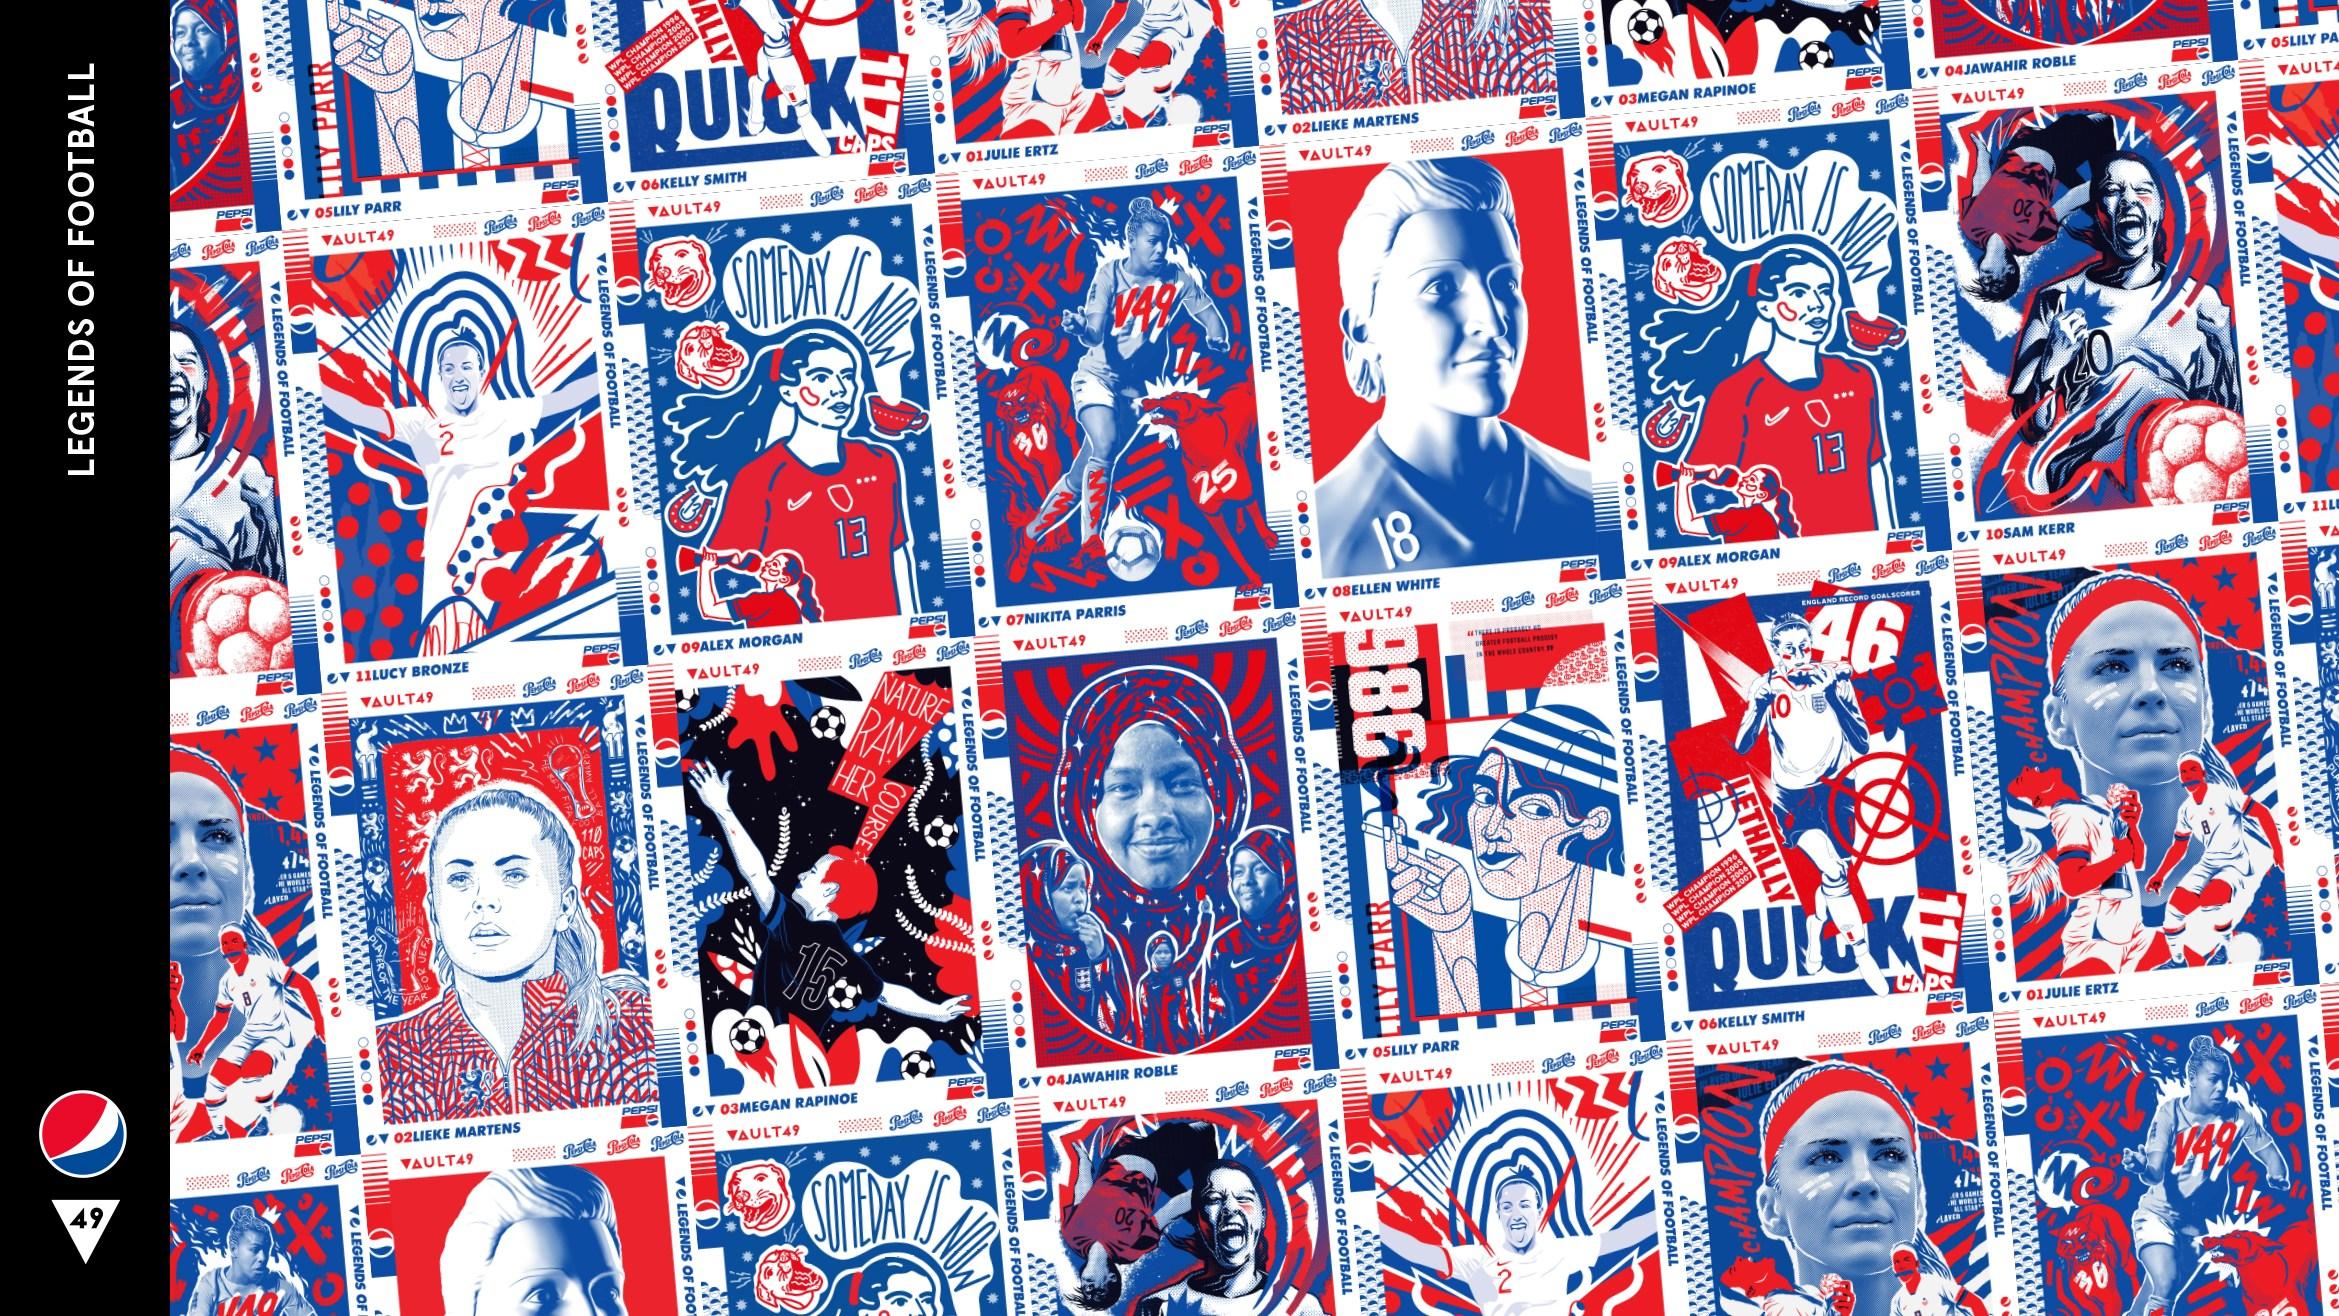 Vault49 | Pepsi | Legends of Football